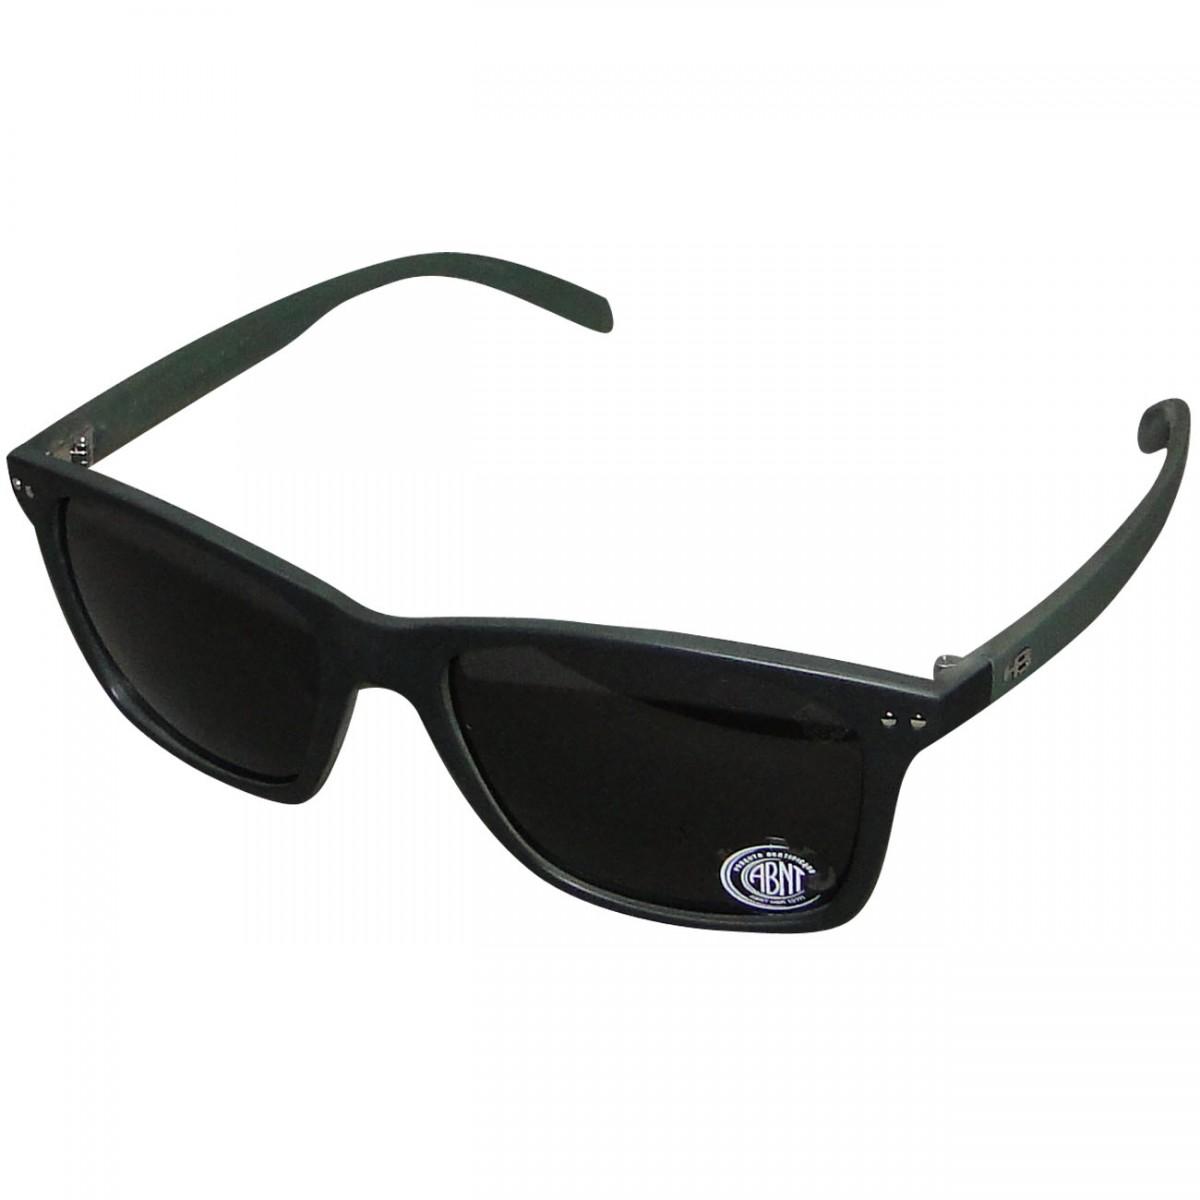 Oculos HB Nevermind 90105635 - Preto Musgo - Chuteira Nike, Adidas ... 0d5ed3ce2b